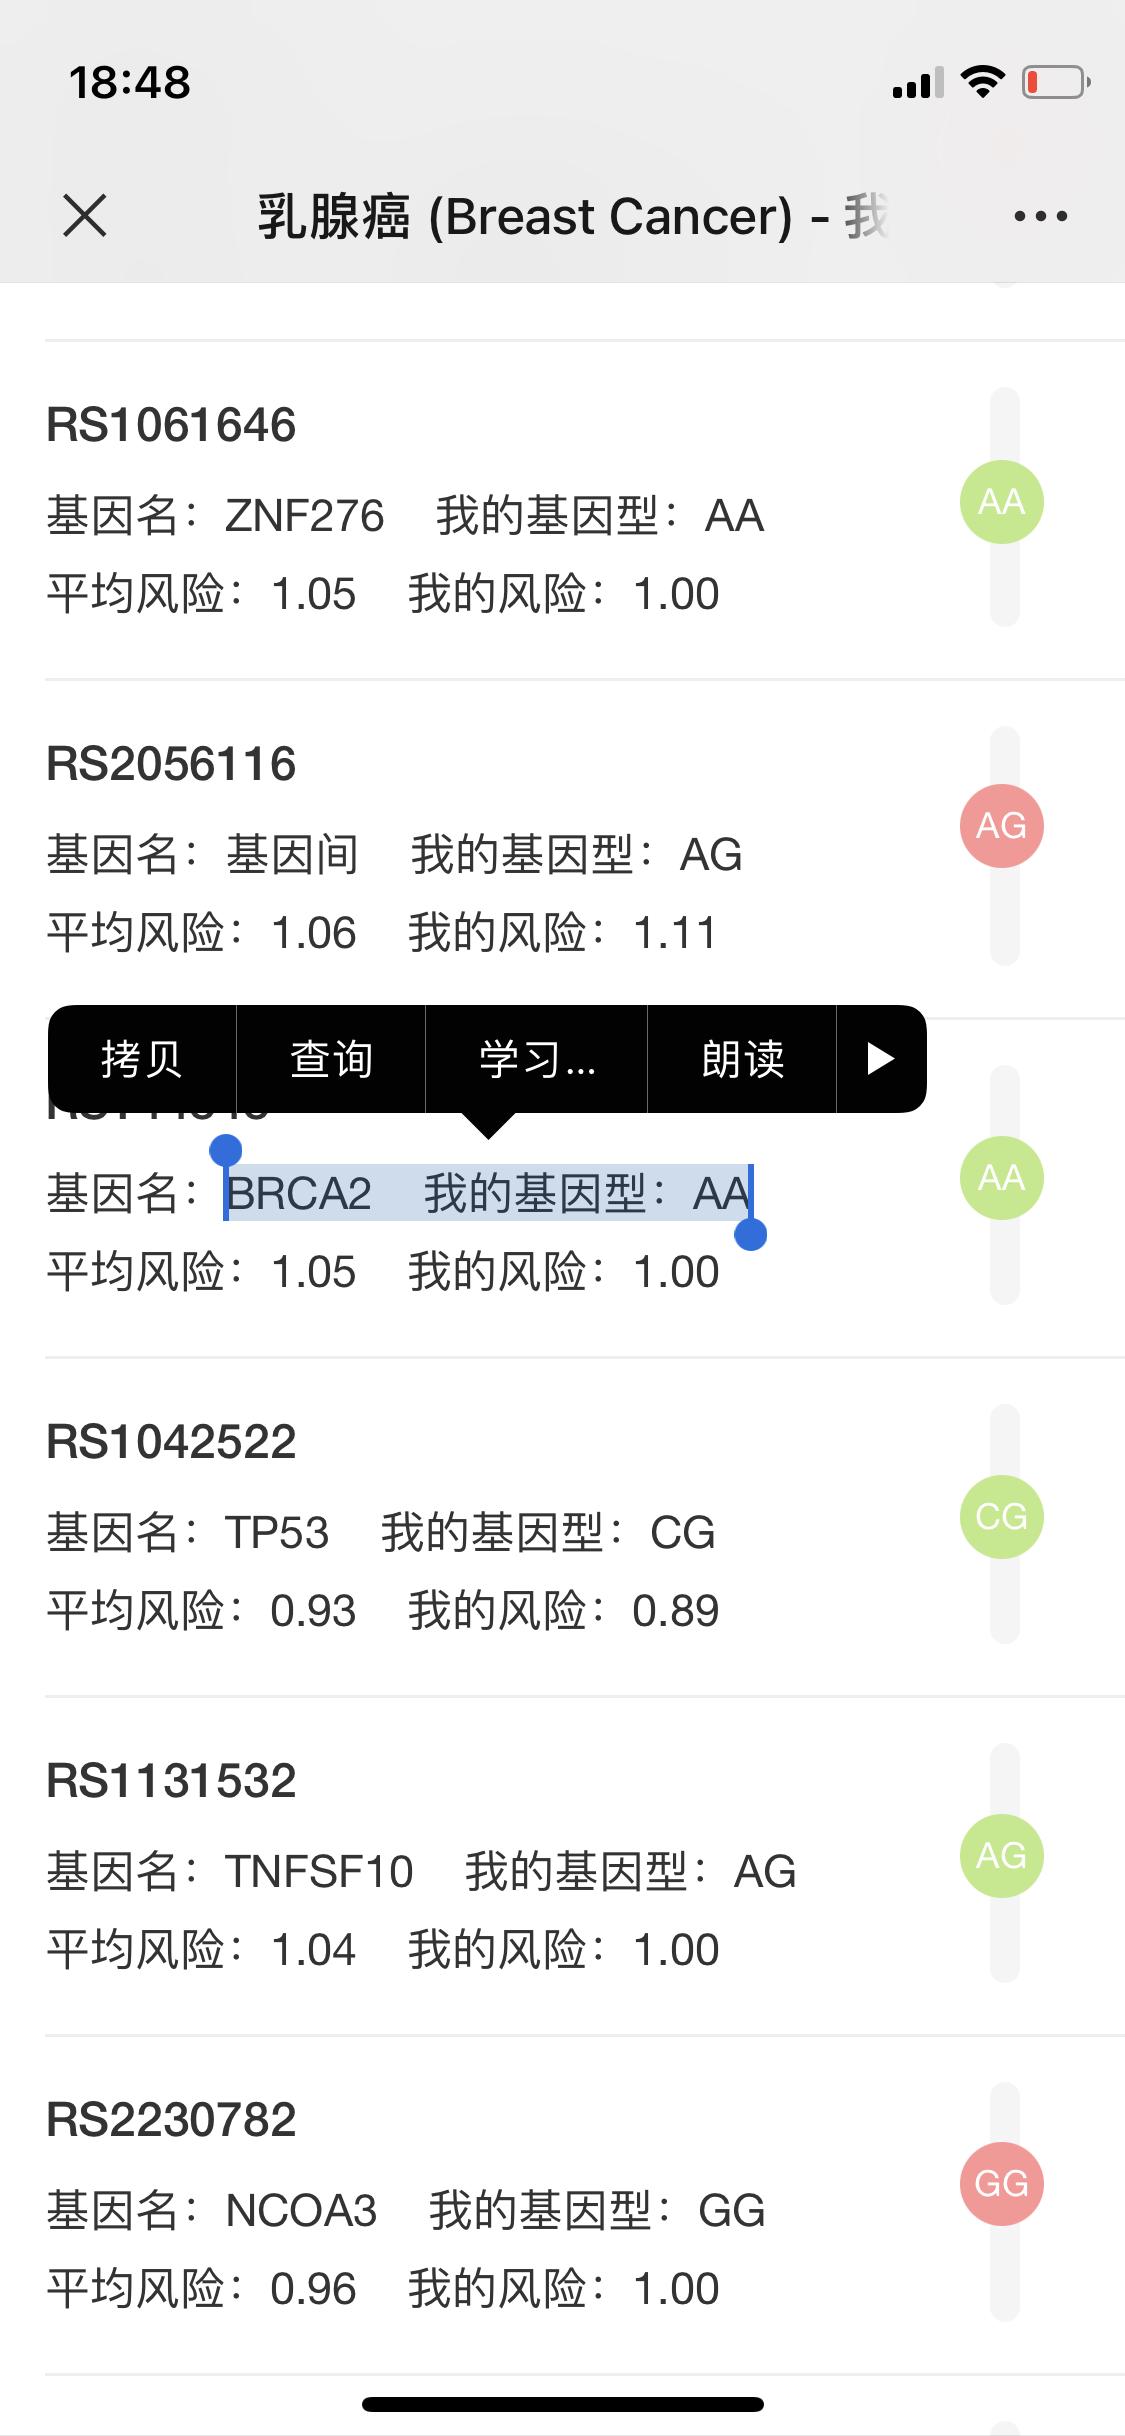 E98B4EAA-5D81-4BEA-9875-AE985AC54E25.png